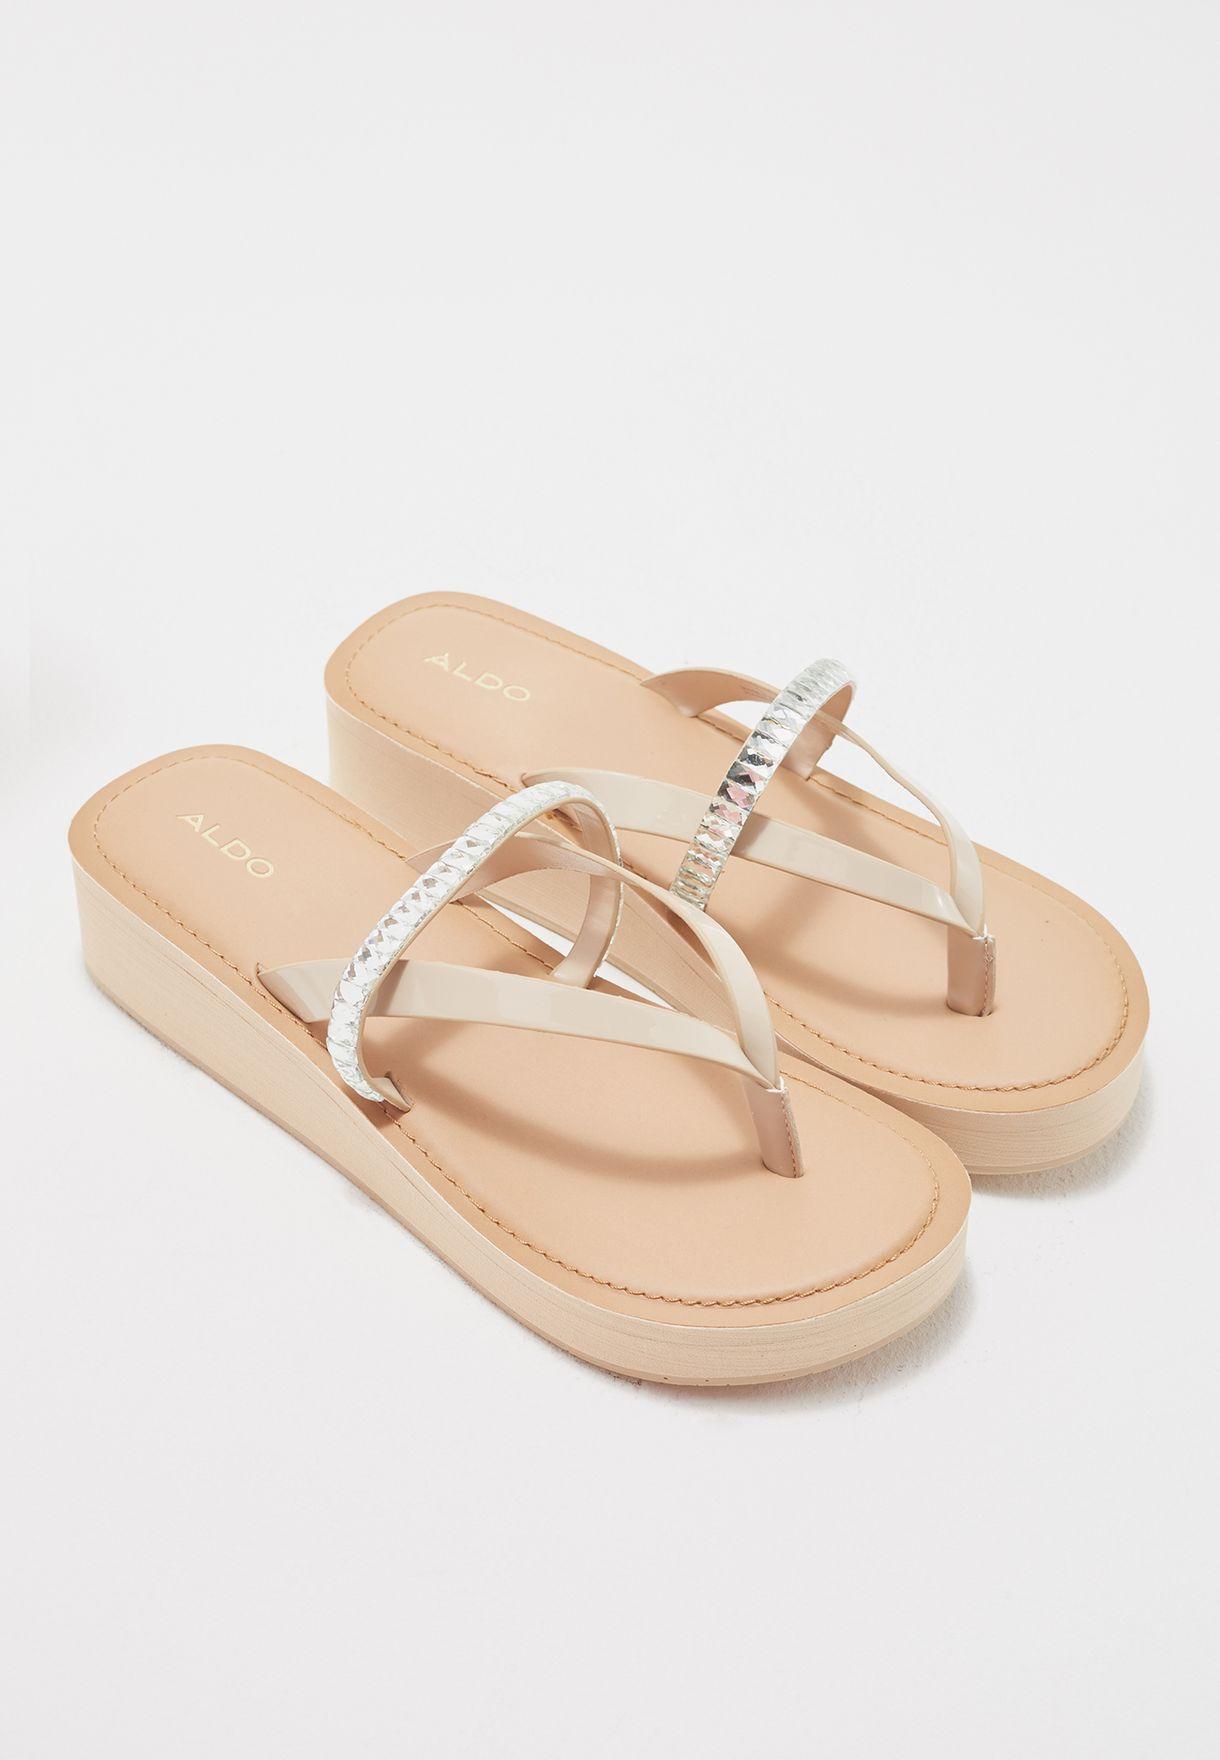 8dd369a91 Shop Aldo pink Embellished Thong Wedge Sandals VERA32 for Women in ...